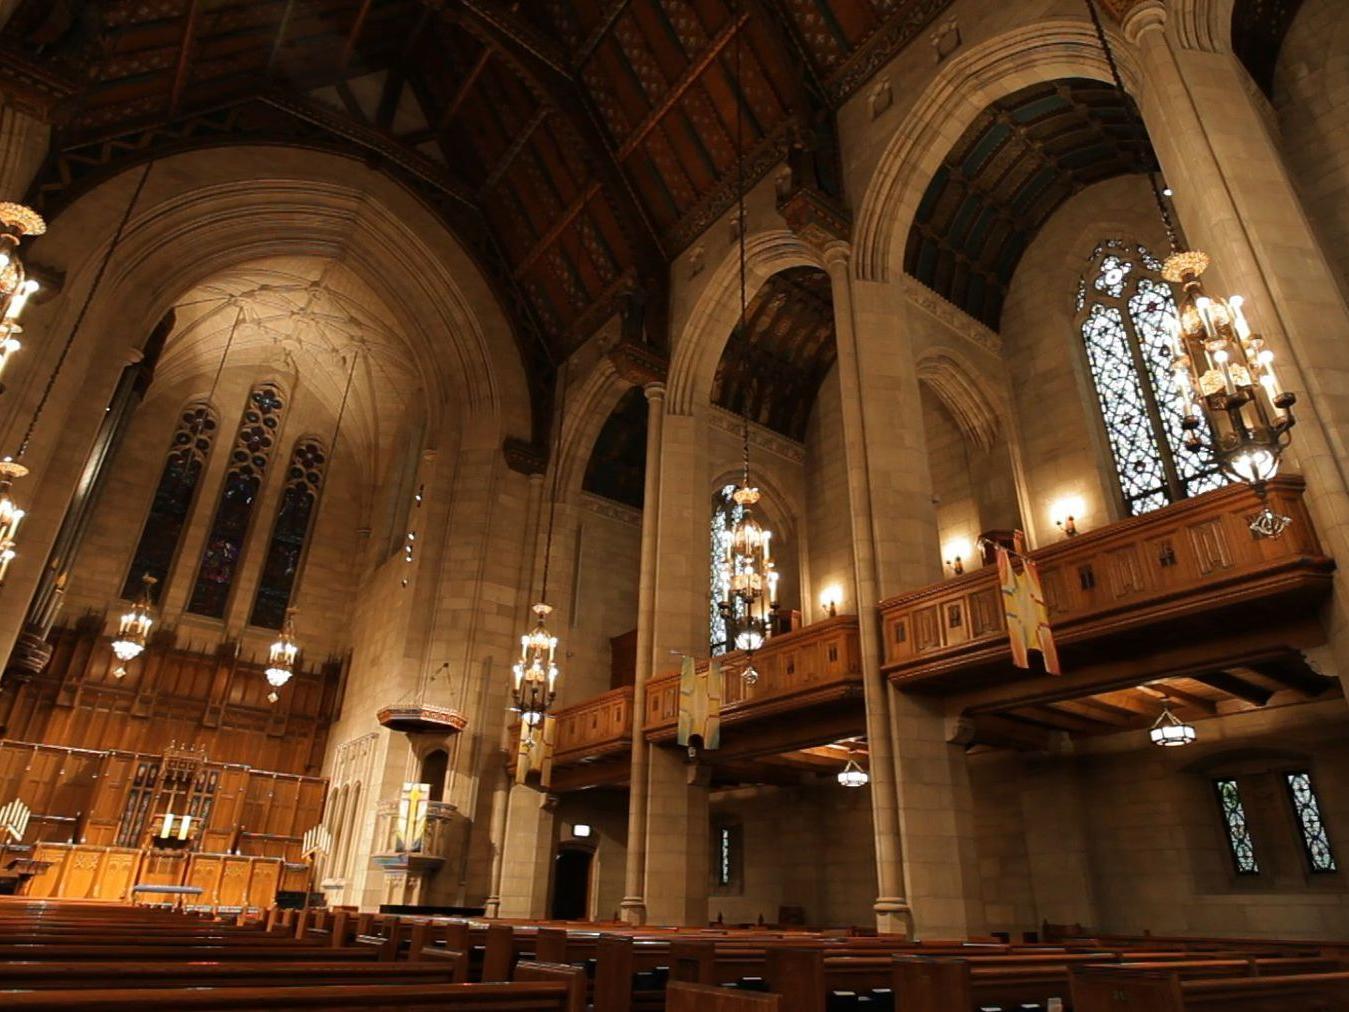 Interior of Fourth Presbyterian Church of Chicago